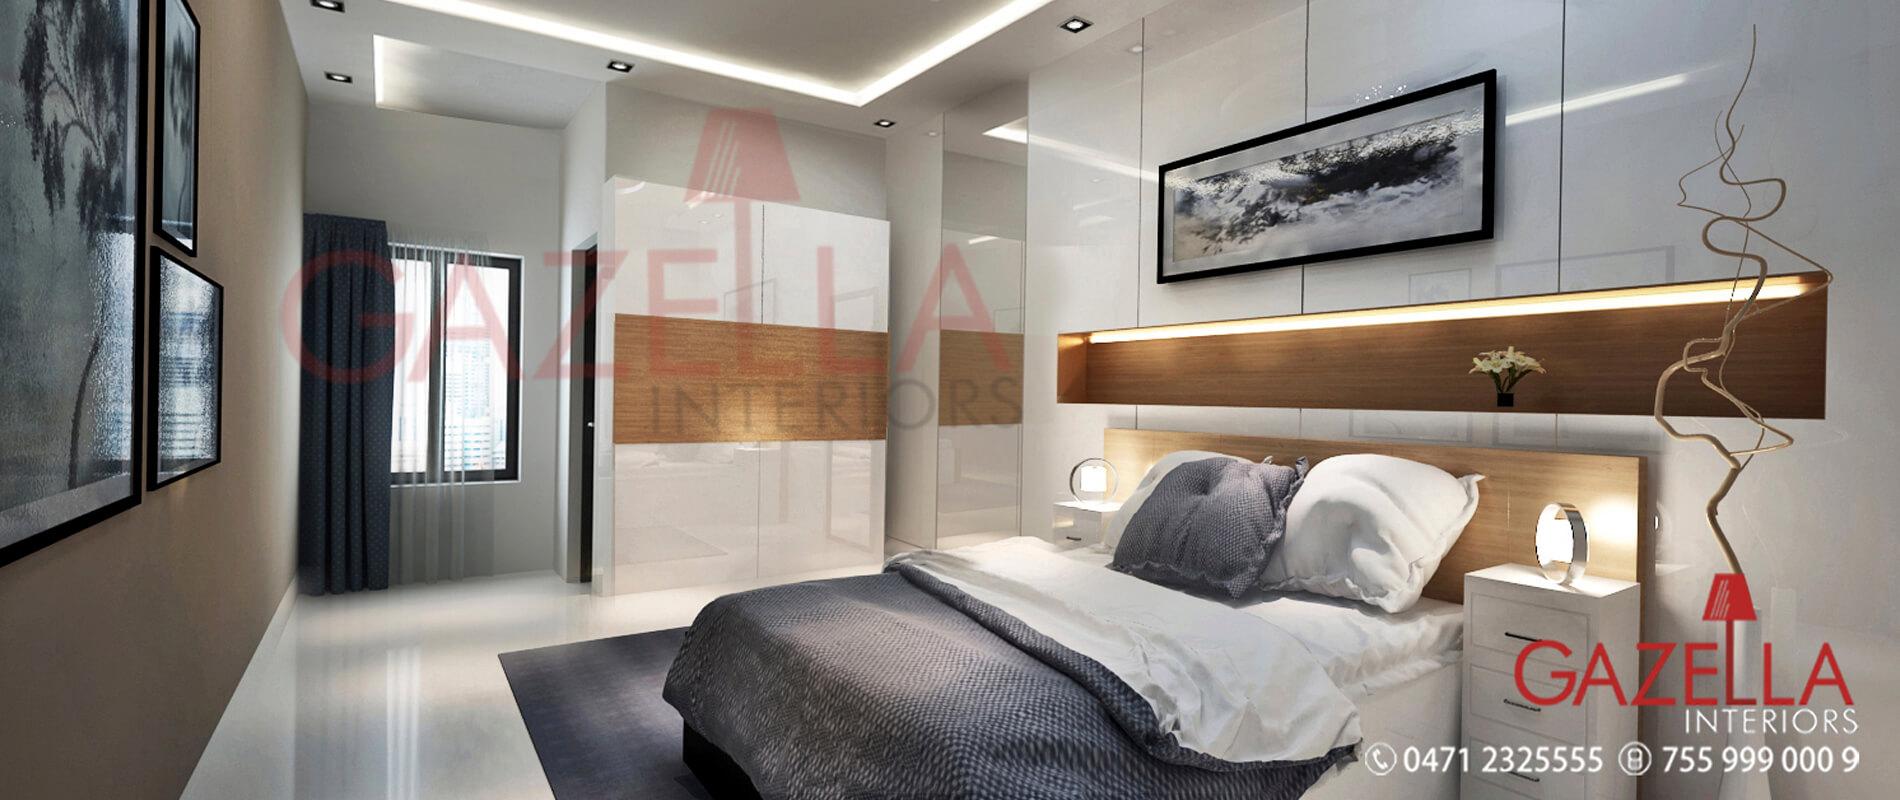 Merveilleux Bedroom Interior Design